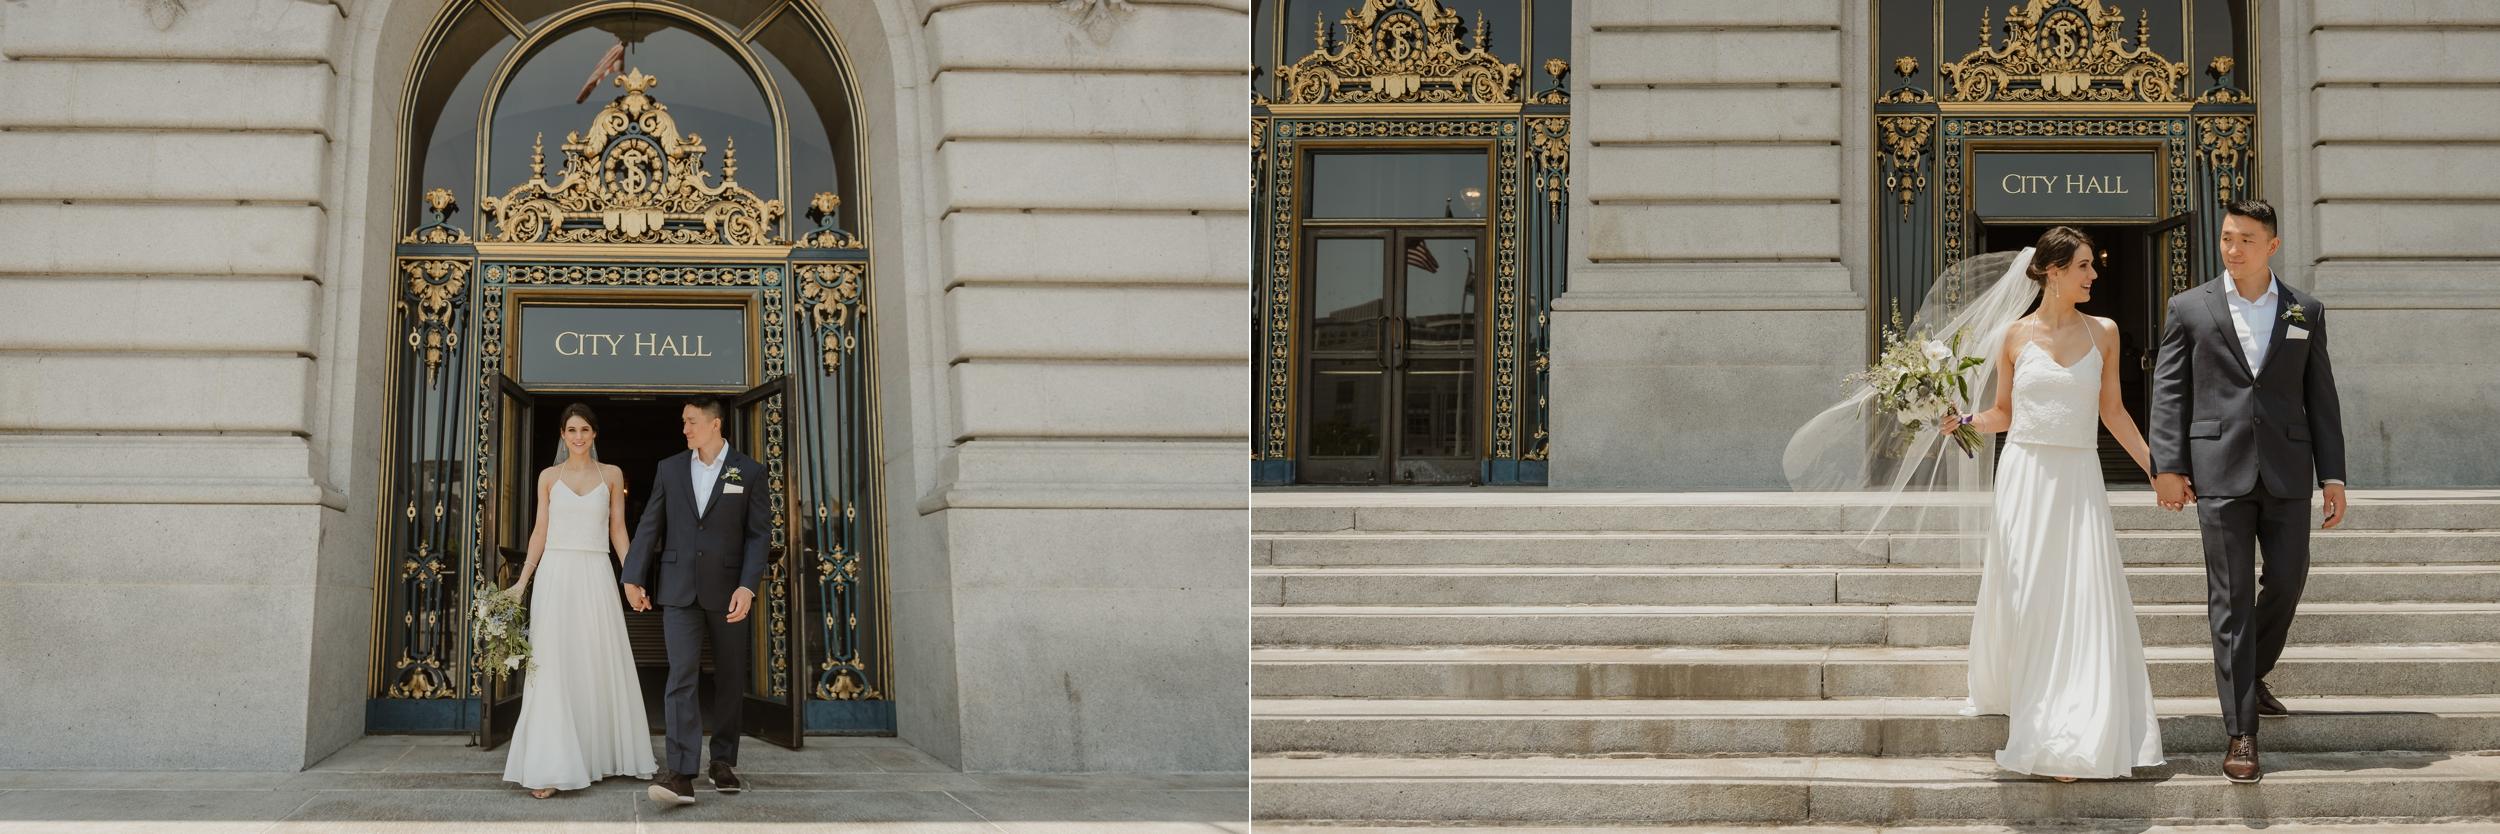 68-destination-san-francisco-city-hall-elopement-vivianchen-366_WEB.jpg